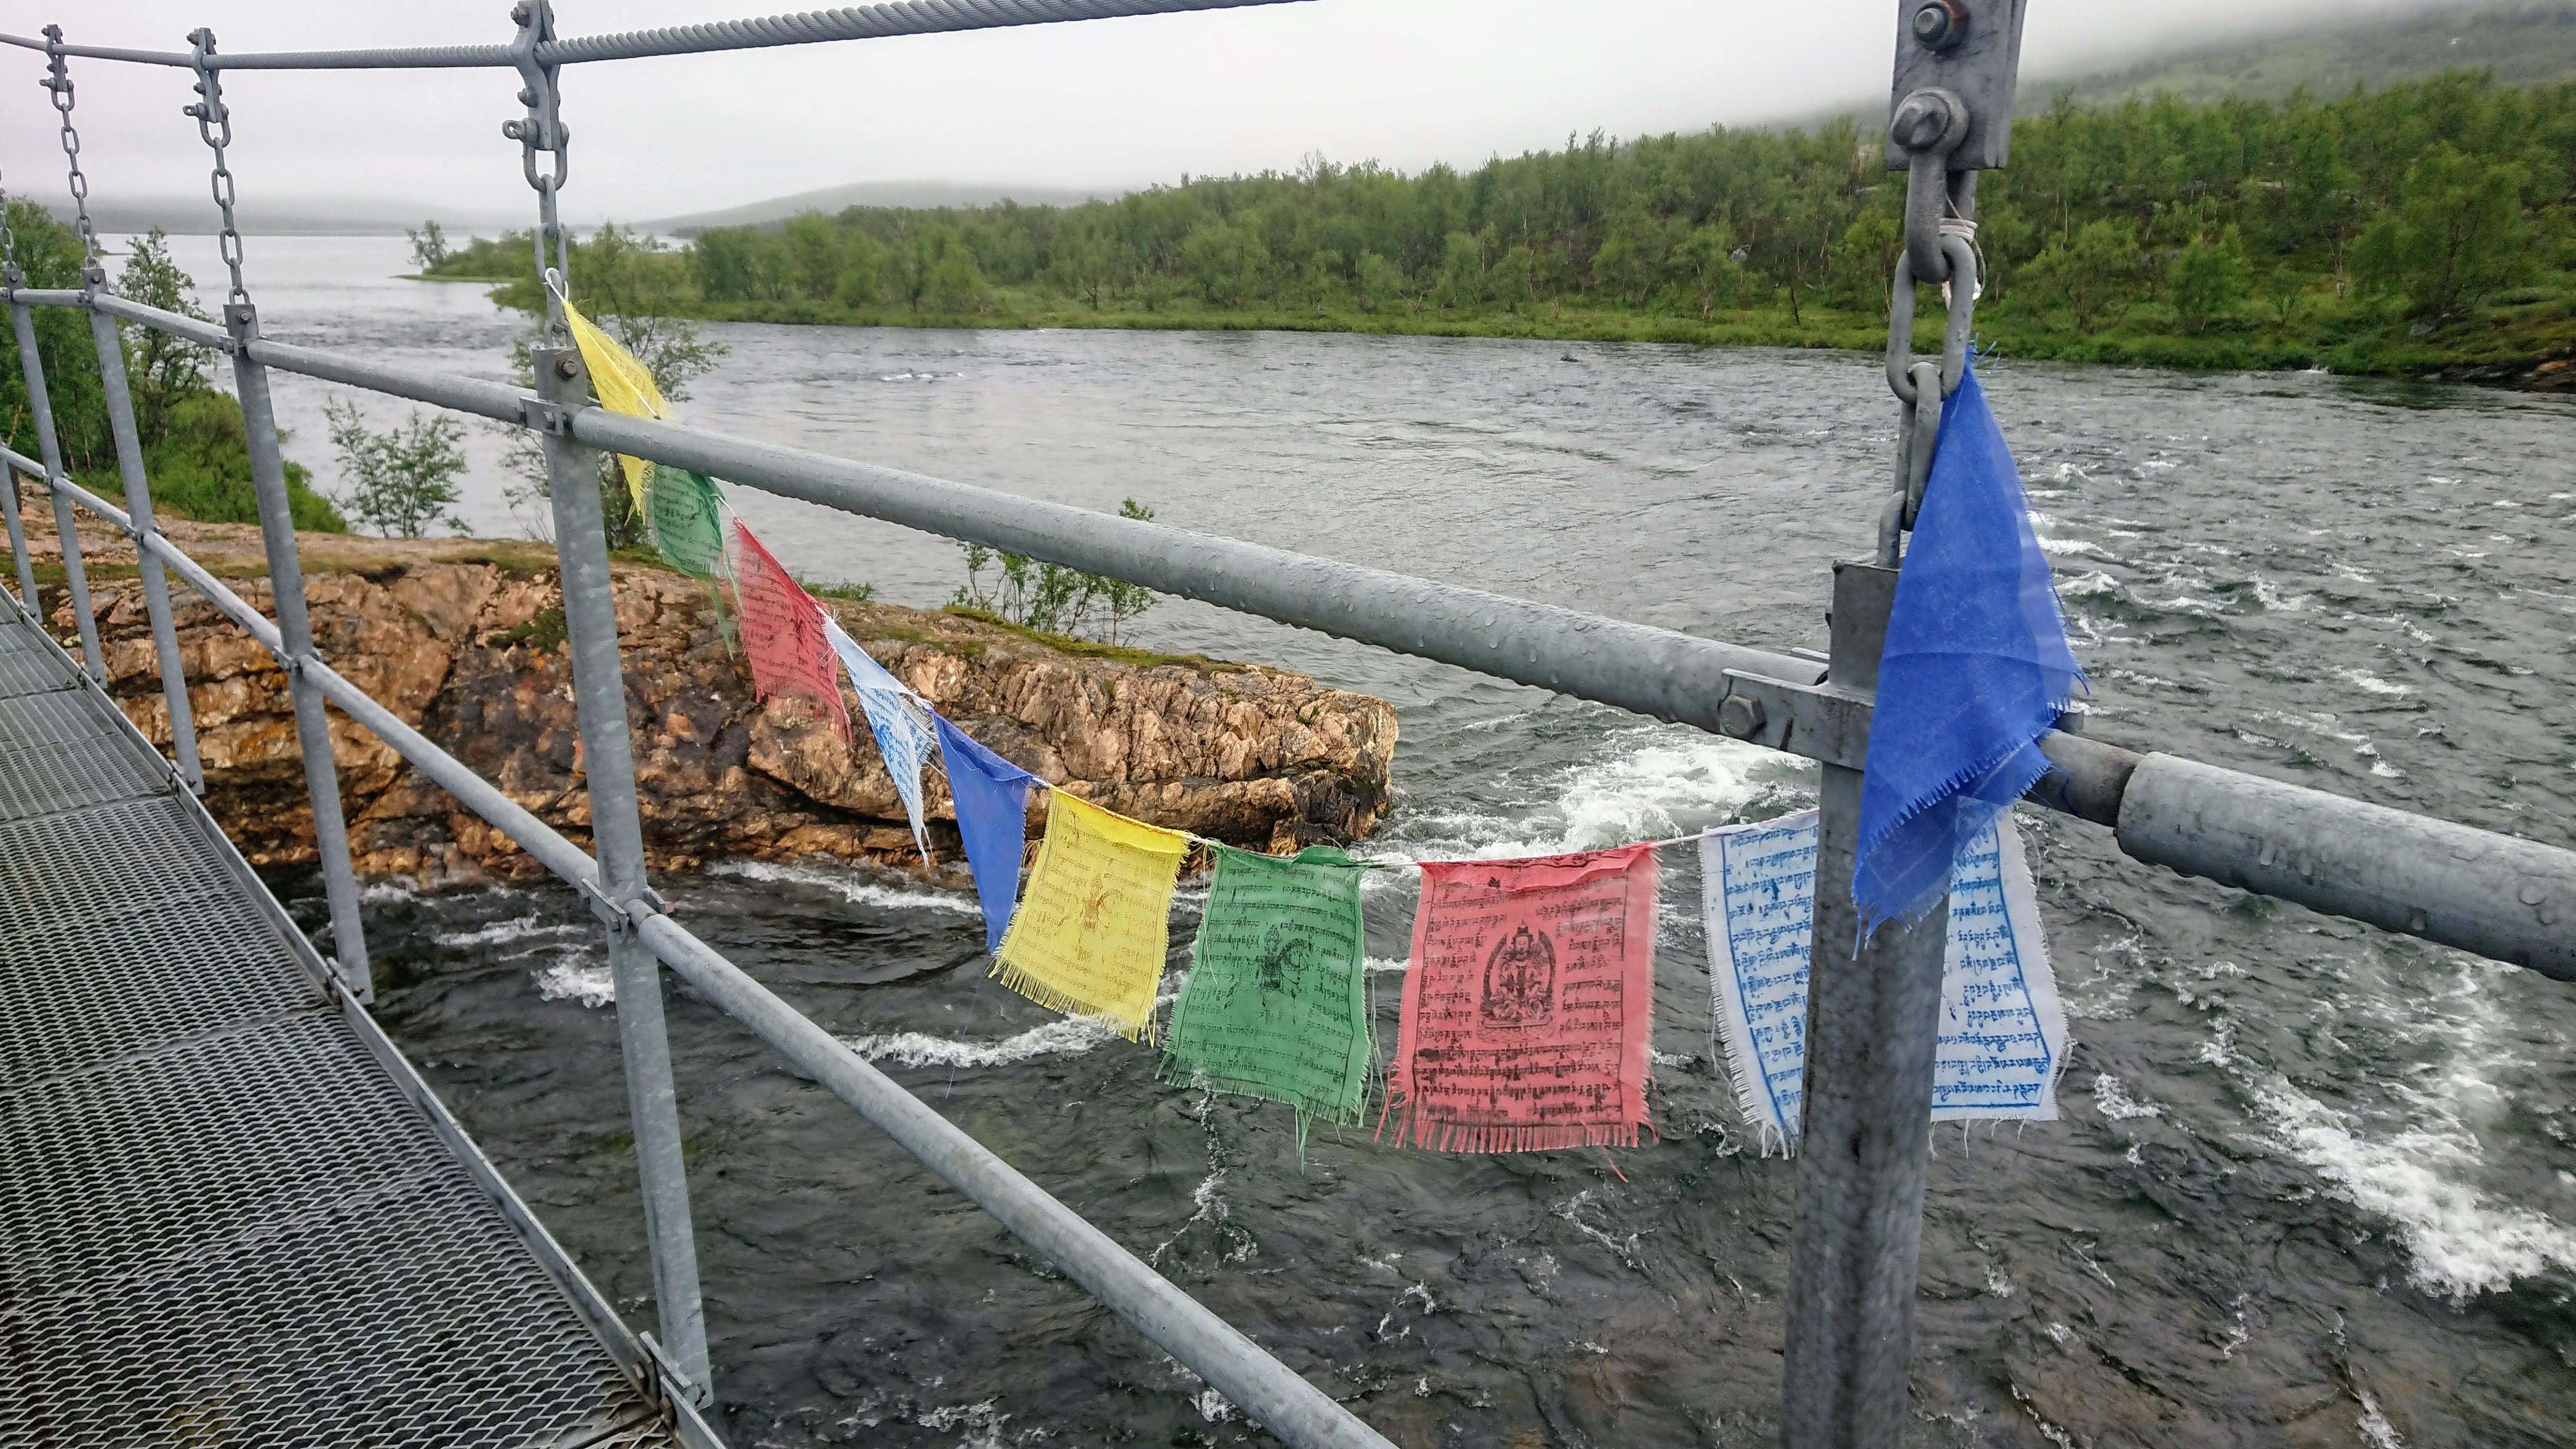 Prayer flags on a bridge before Abiskojaure